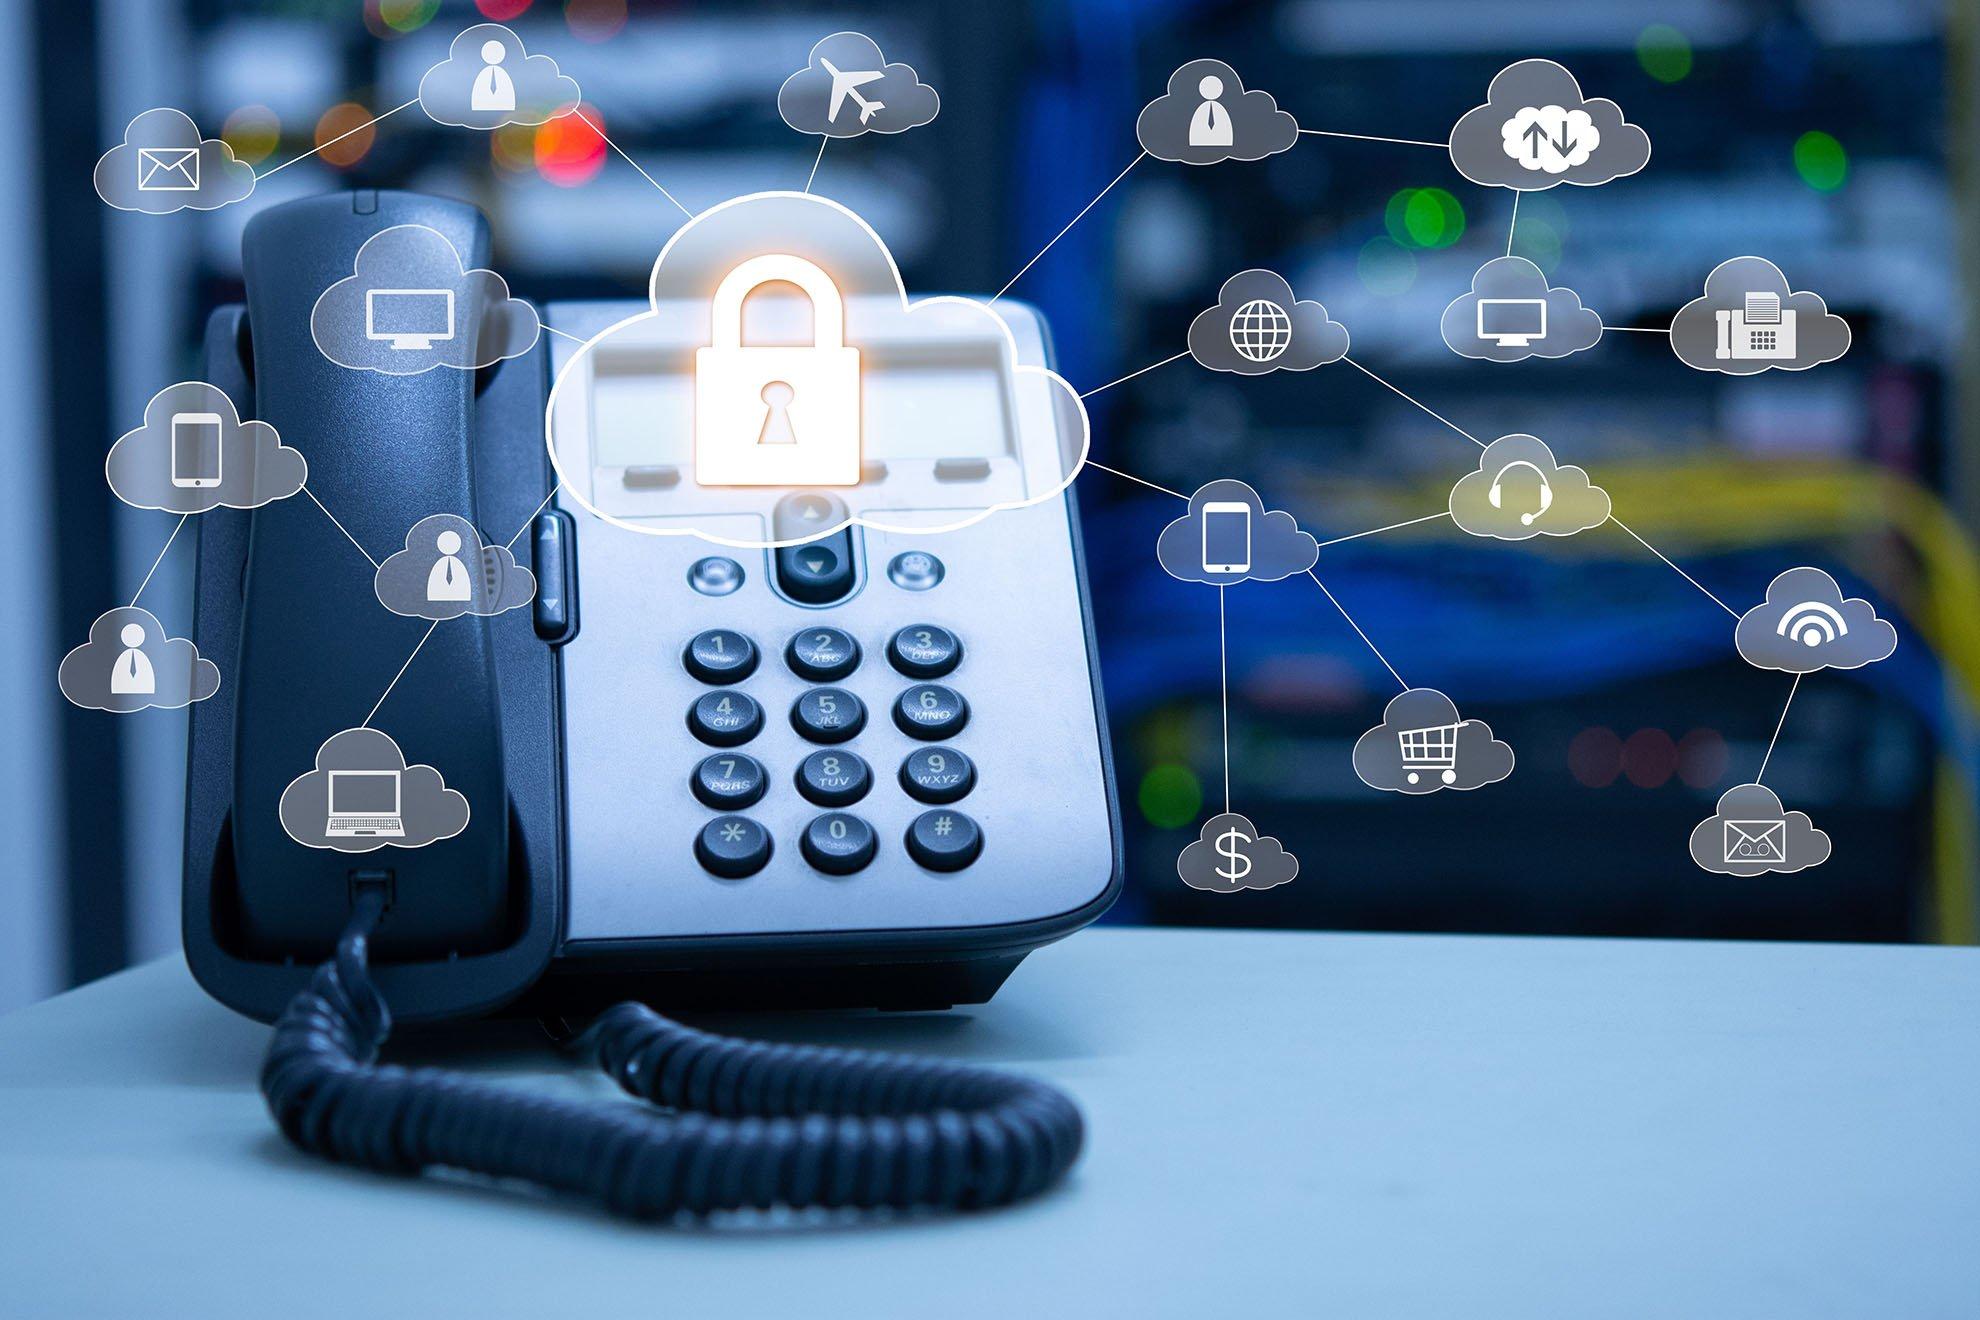 pbx-phone-system